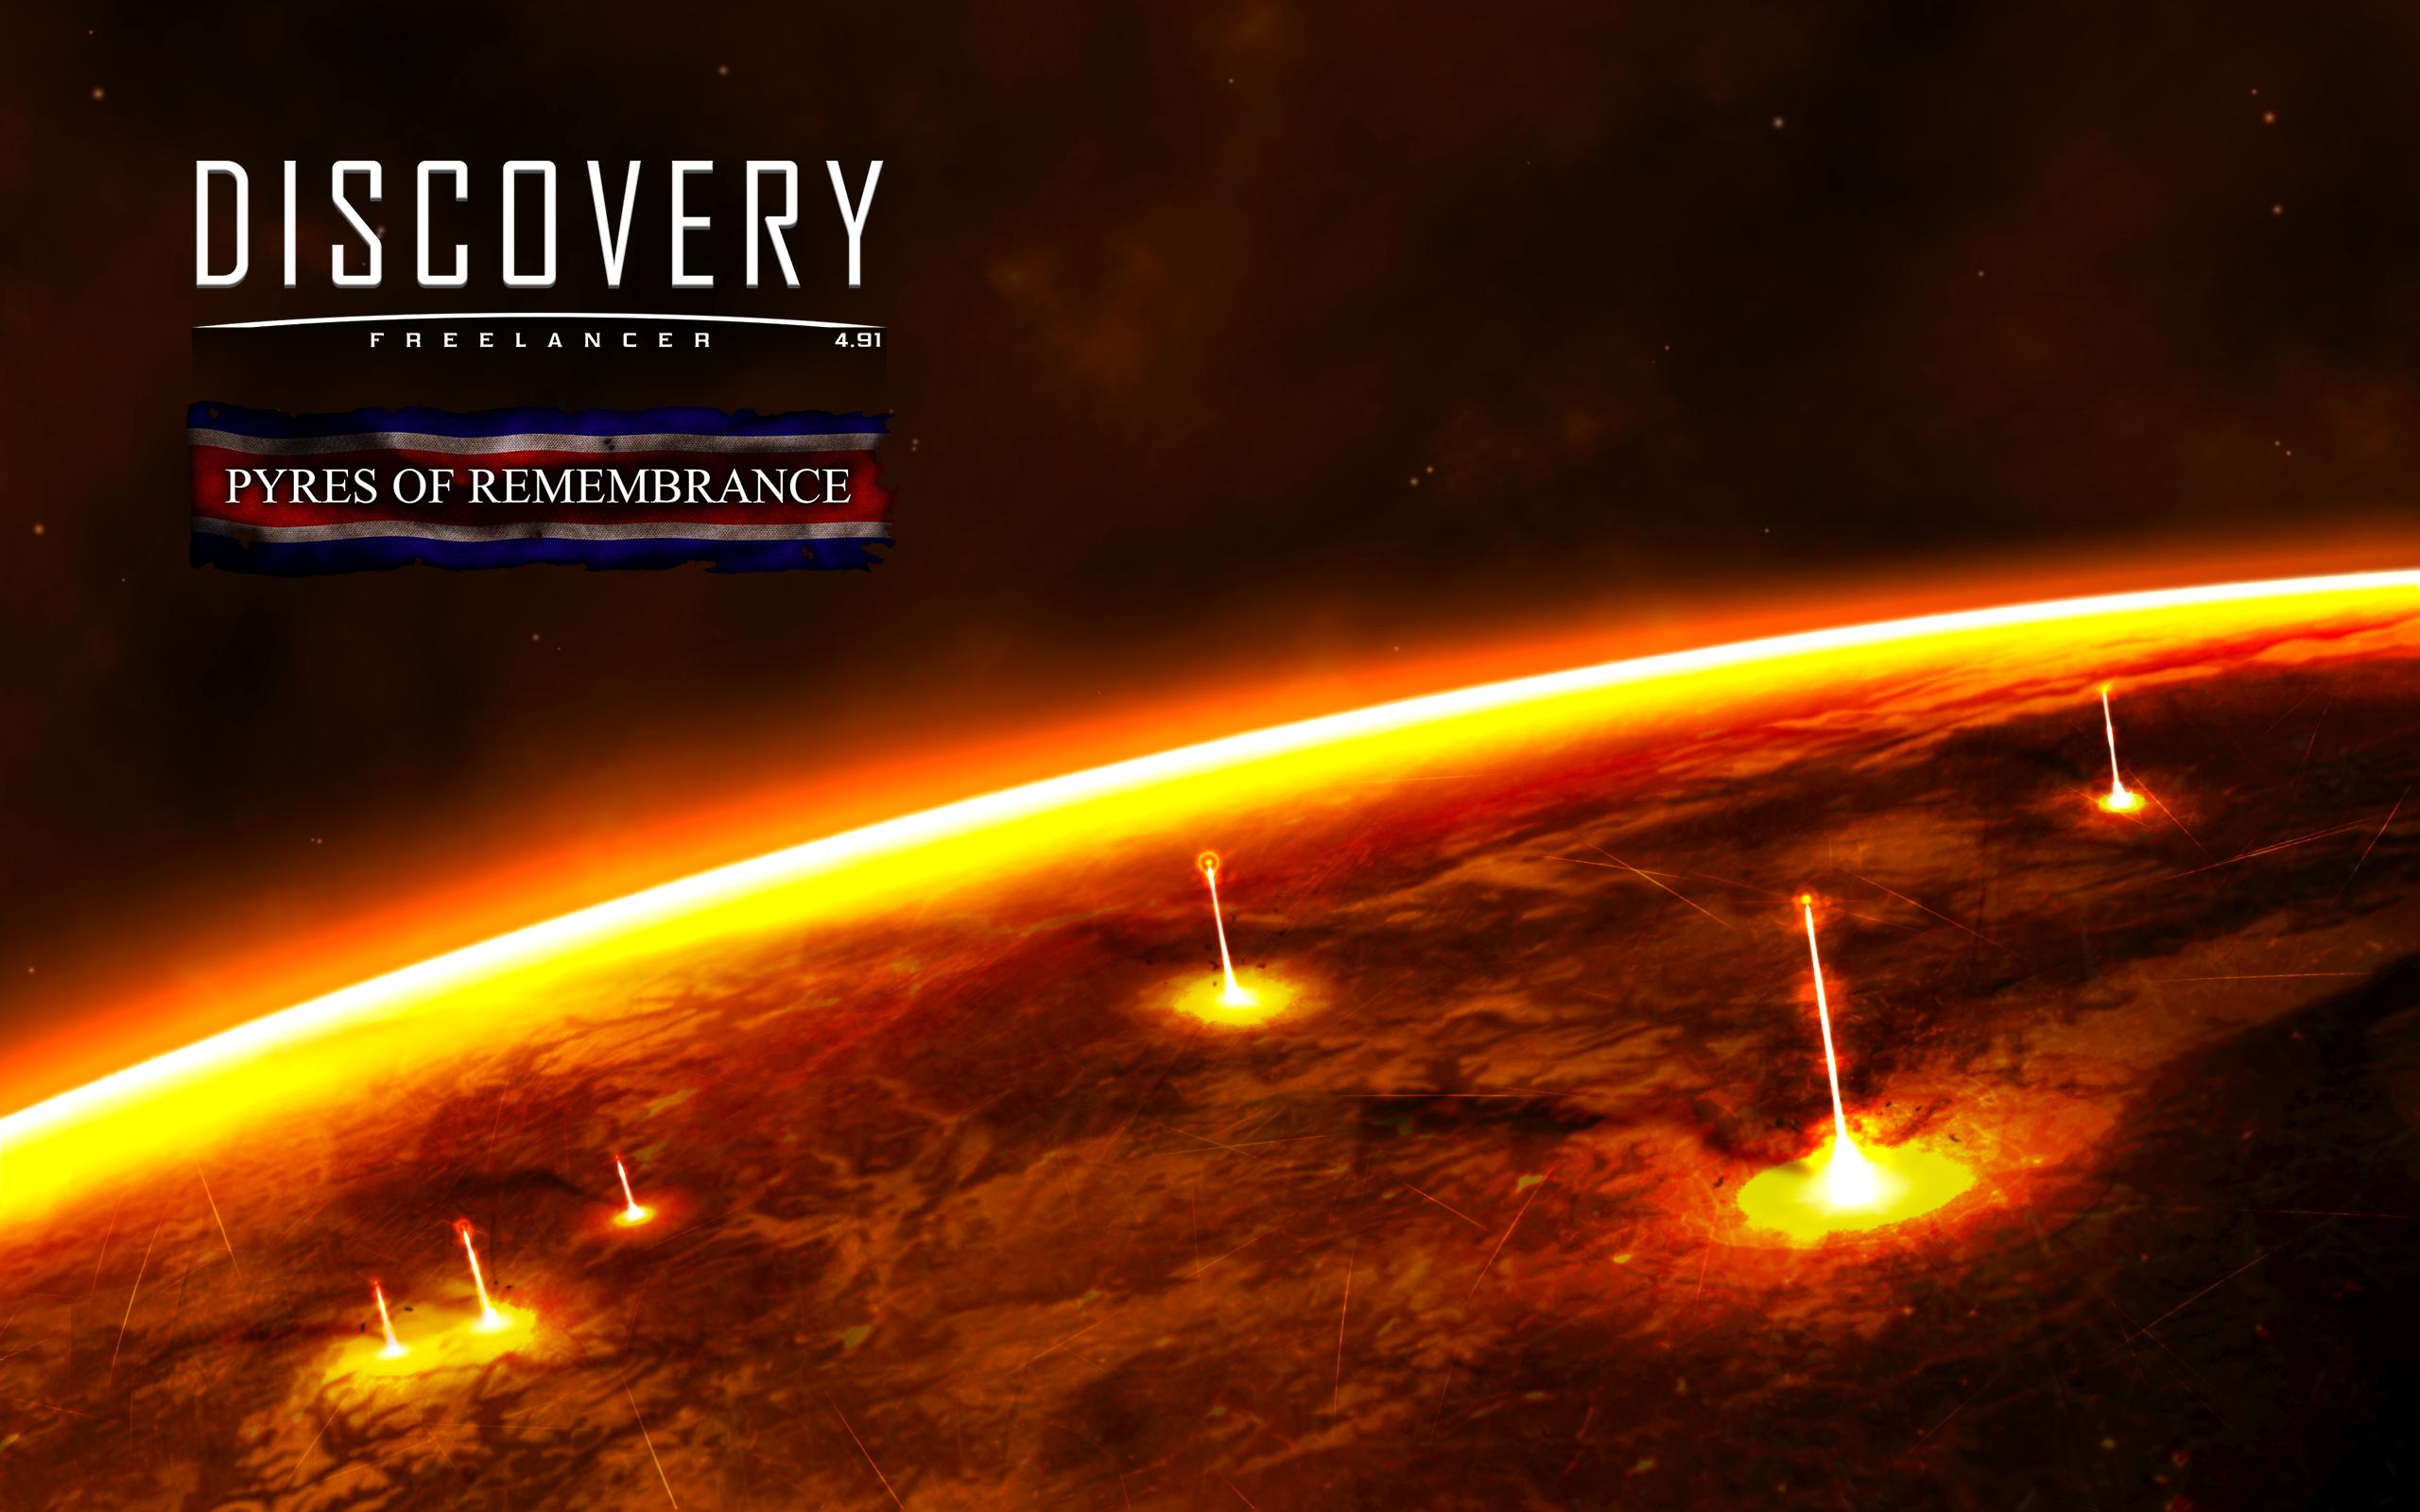 discovery freelancer 4.87